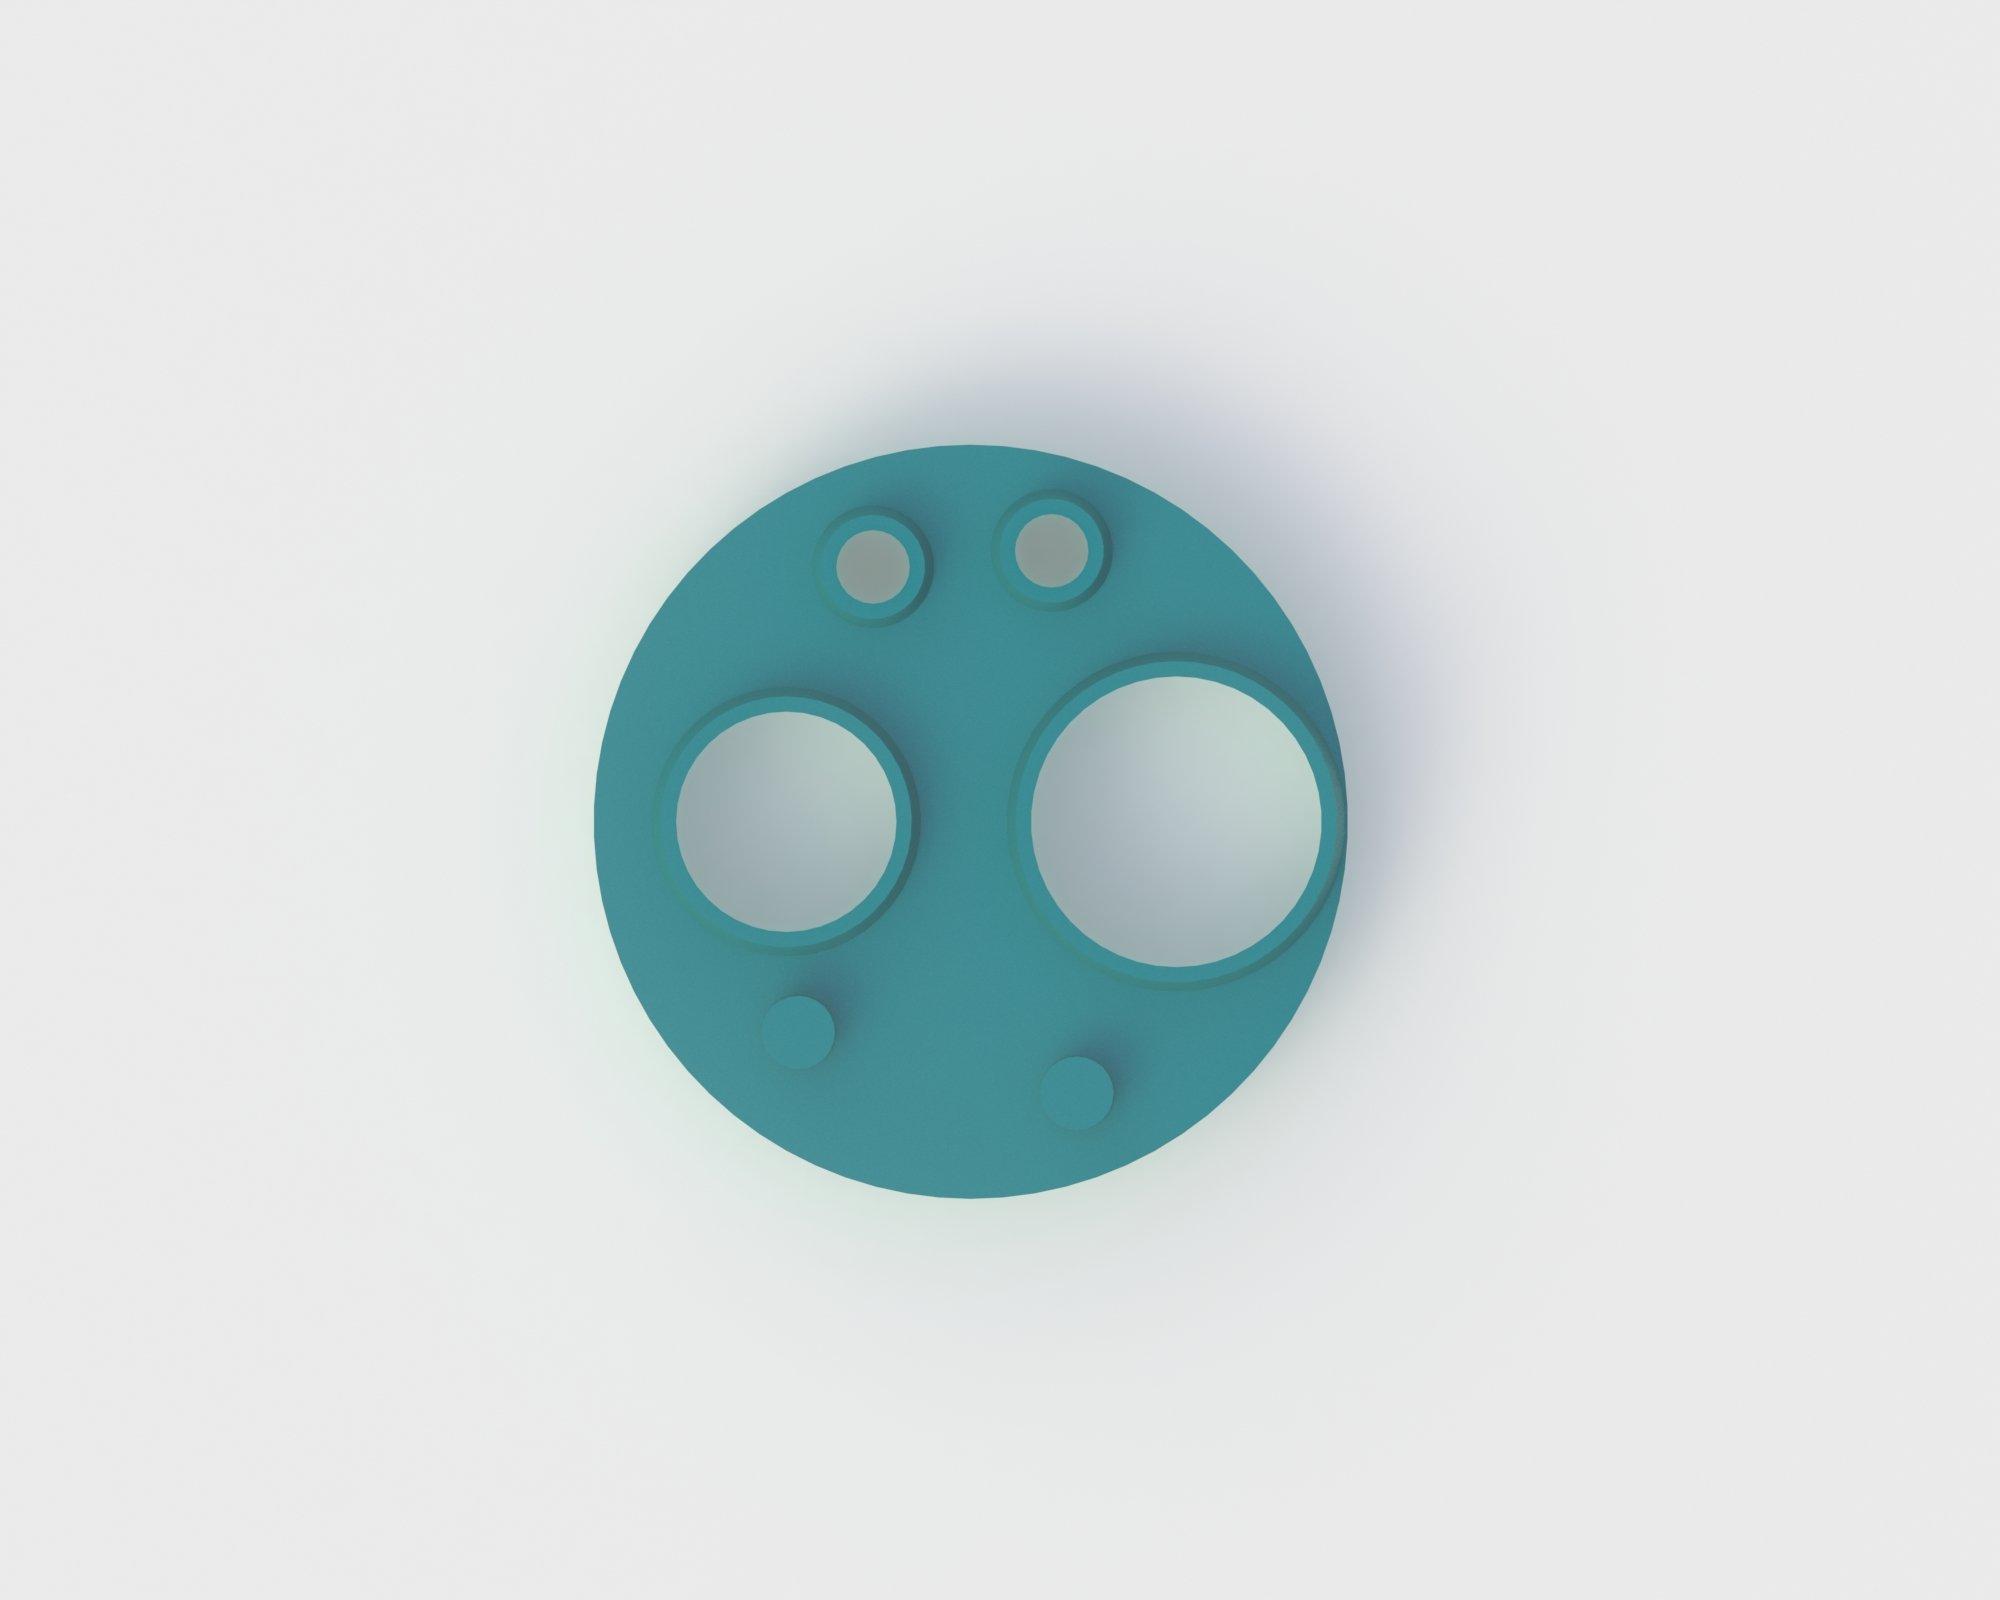 4-Hole Gasket